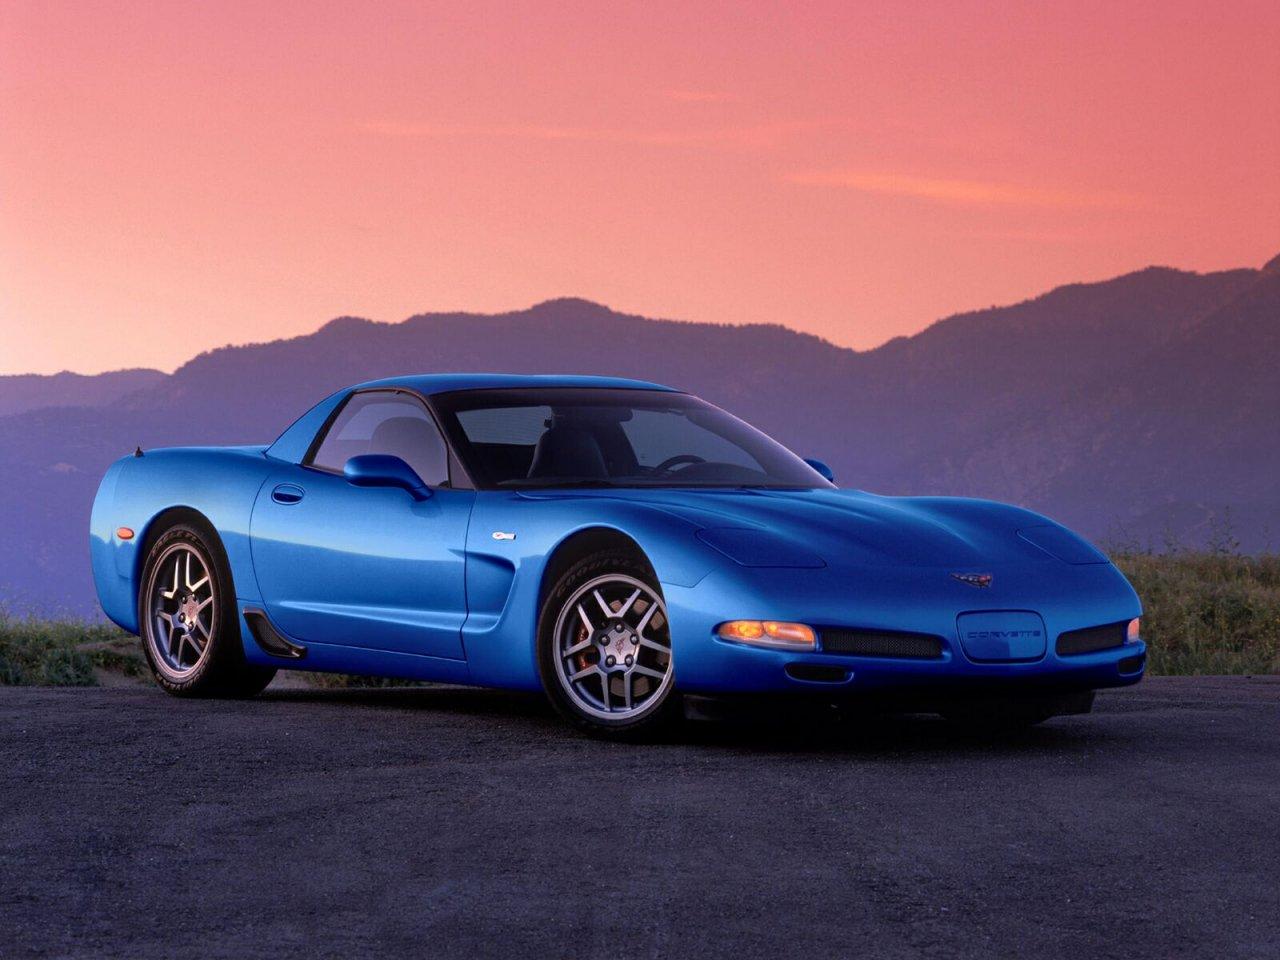 Kekurangan Corvette C5 Z06 Perbandingan Harga